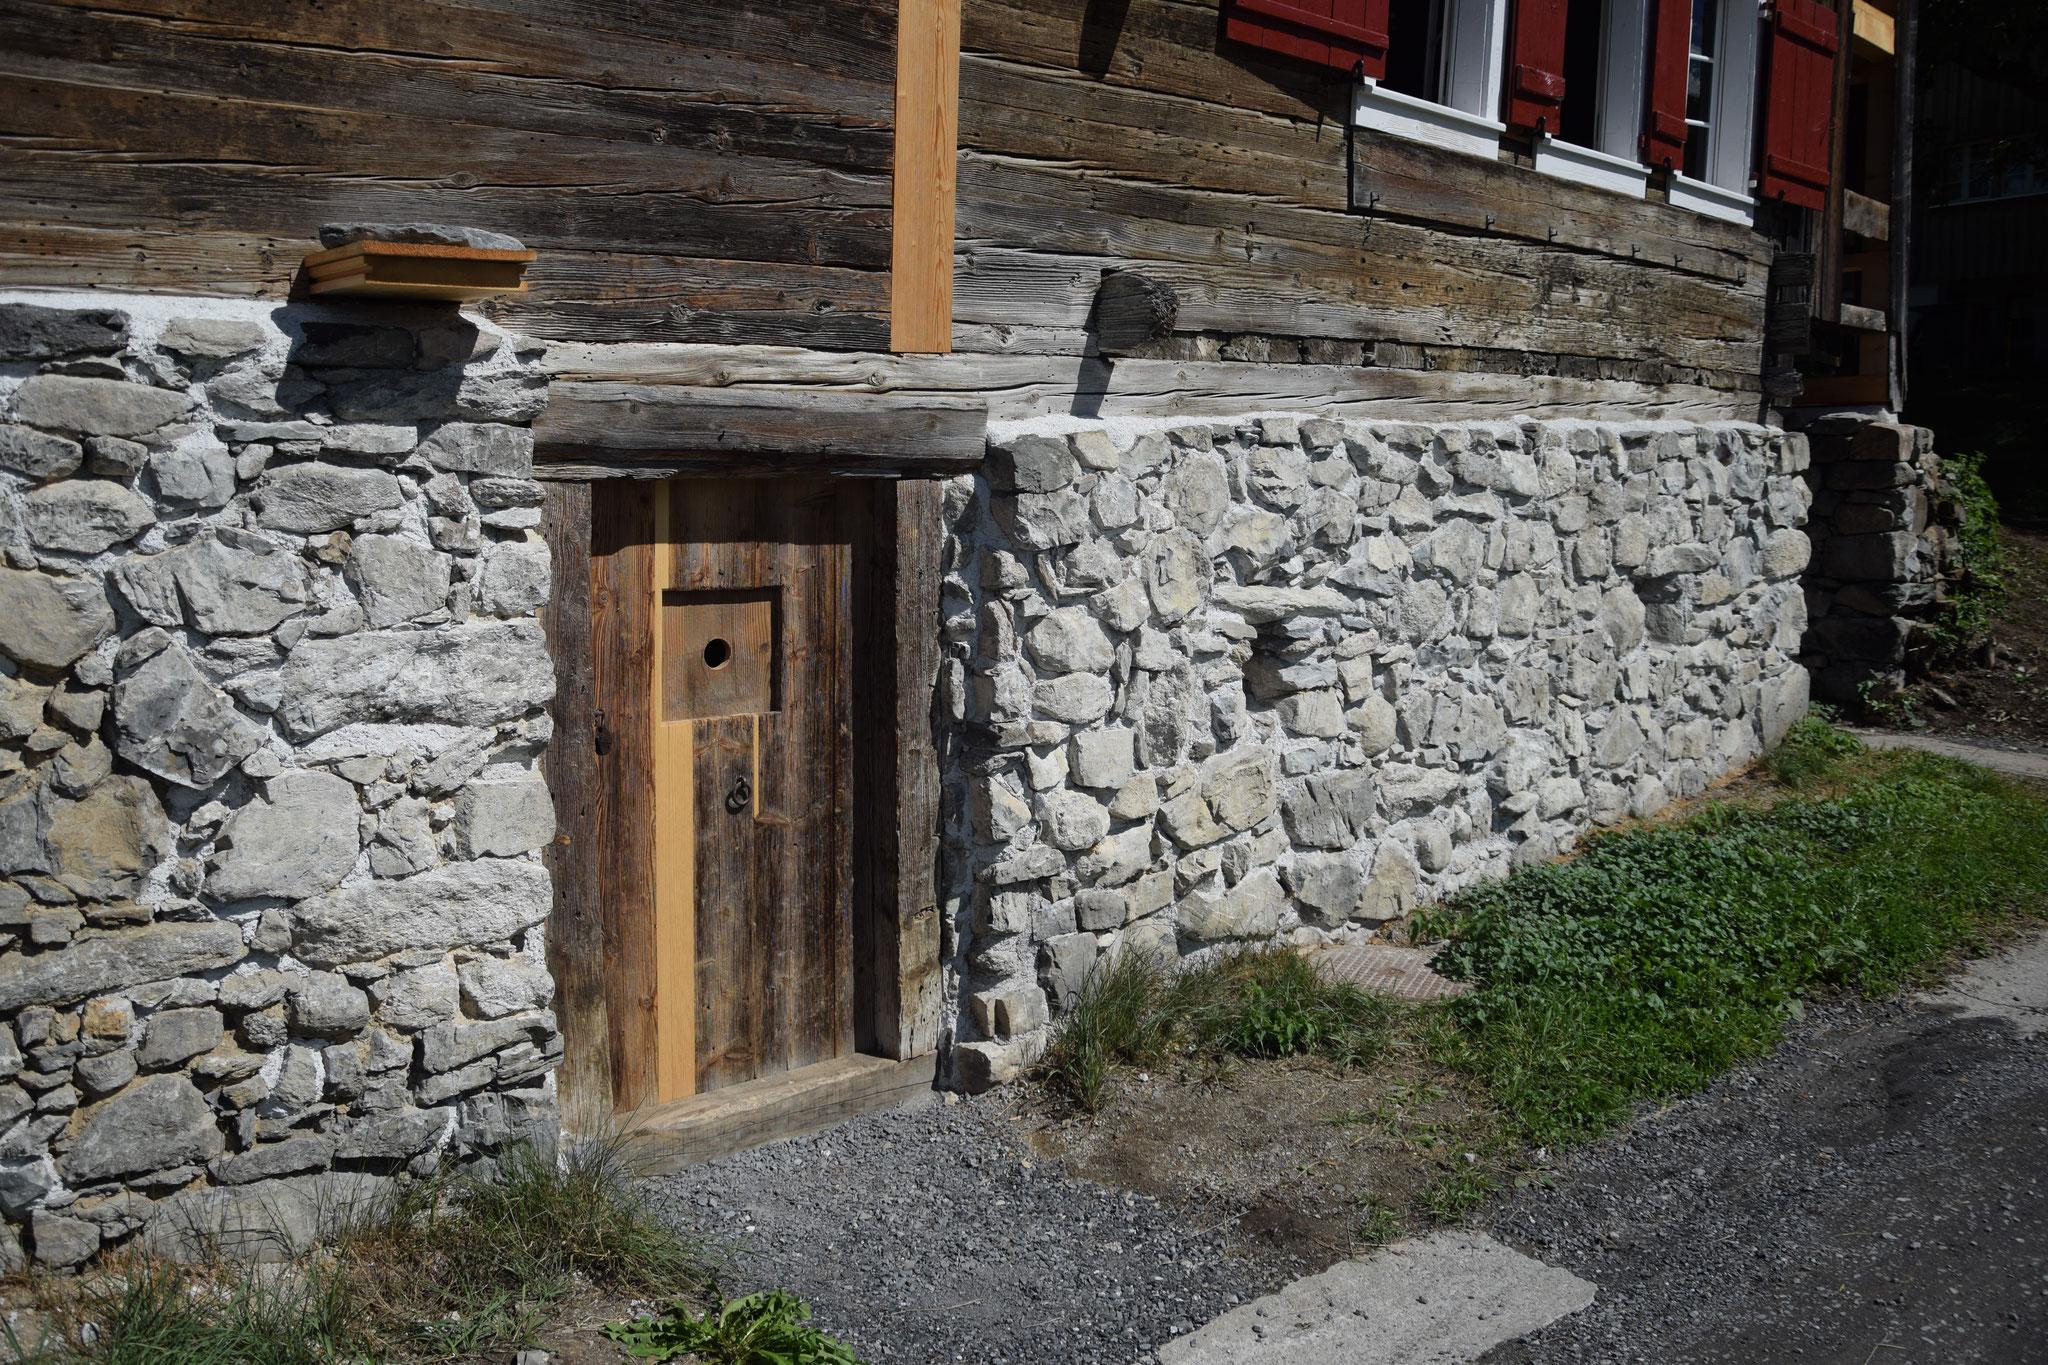 Haus Tannen Morschach, Kt. Schwyz